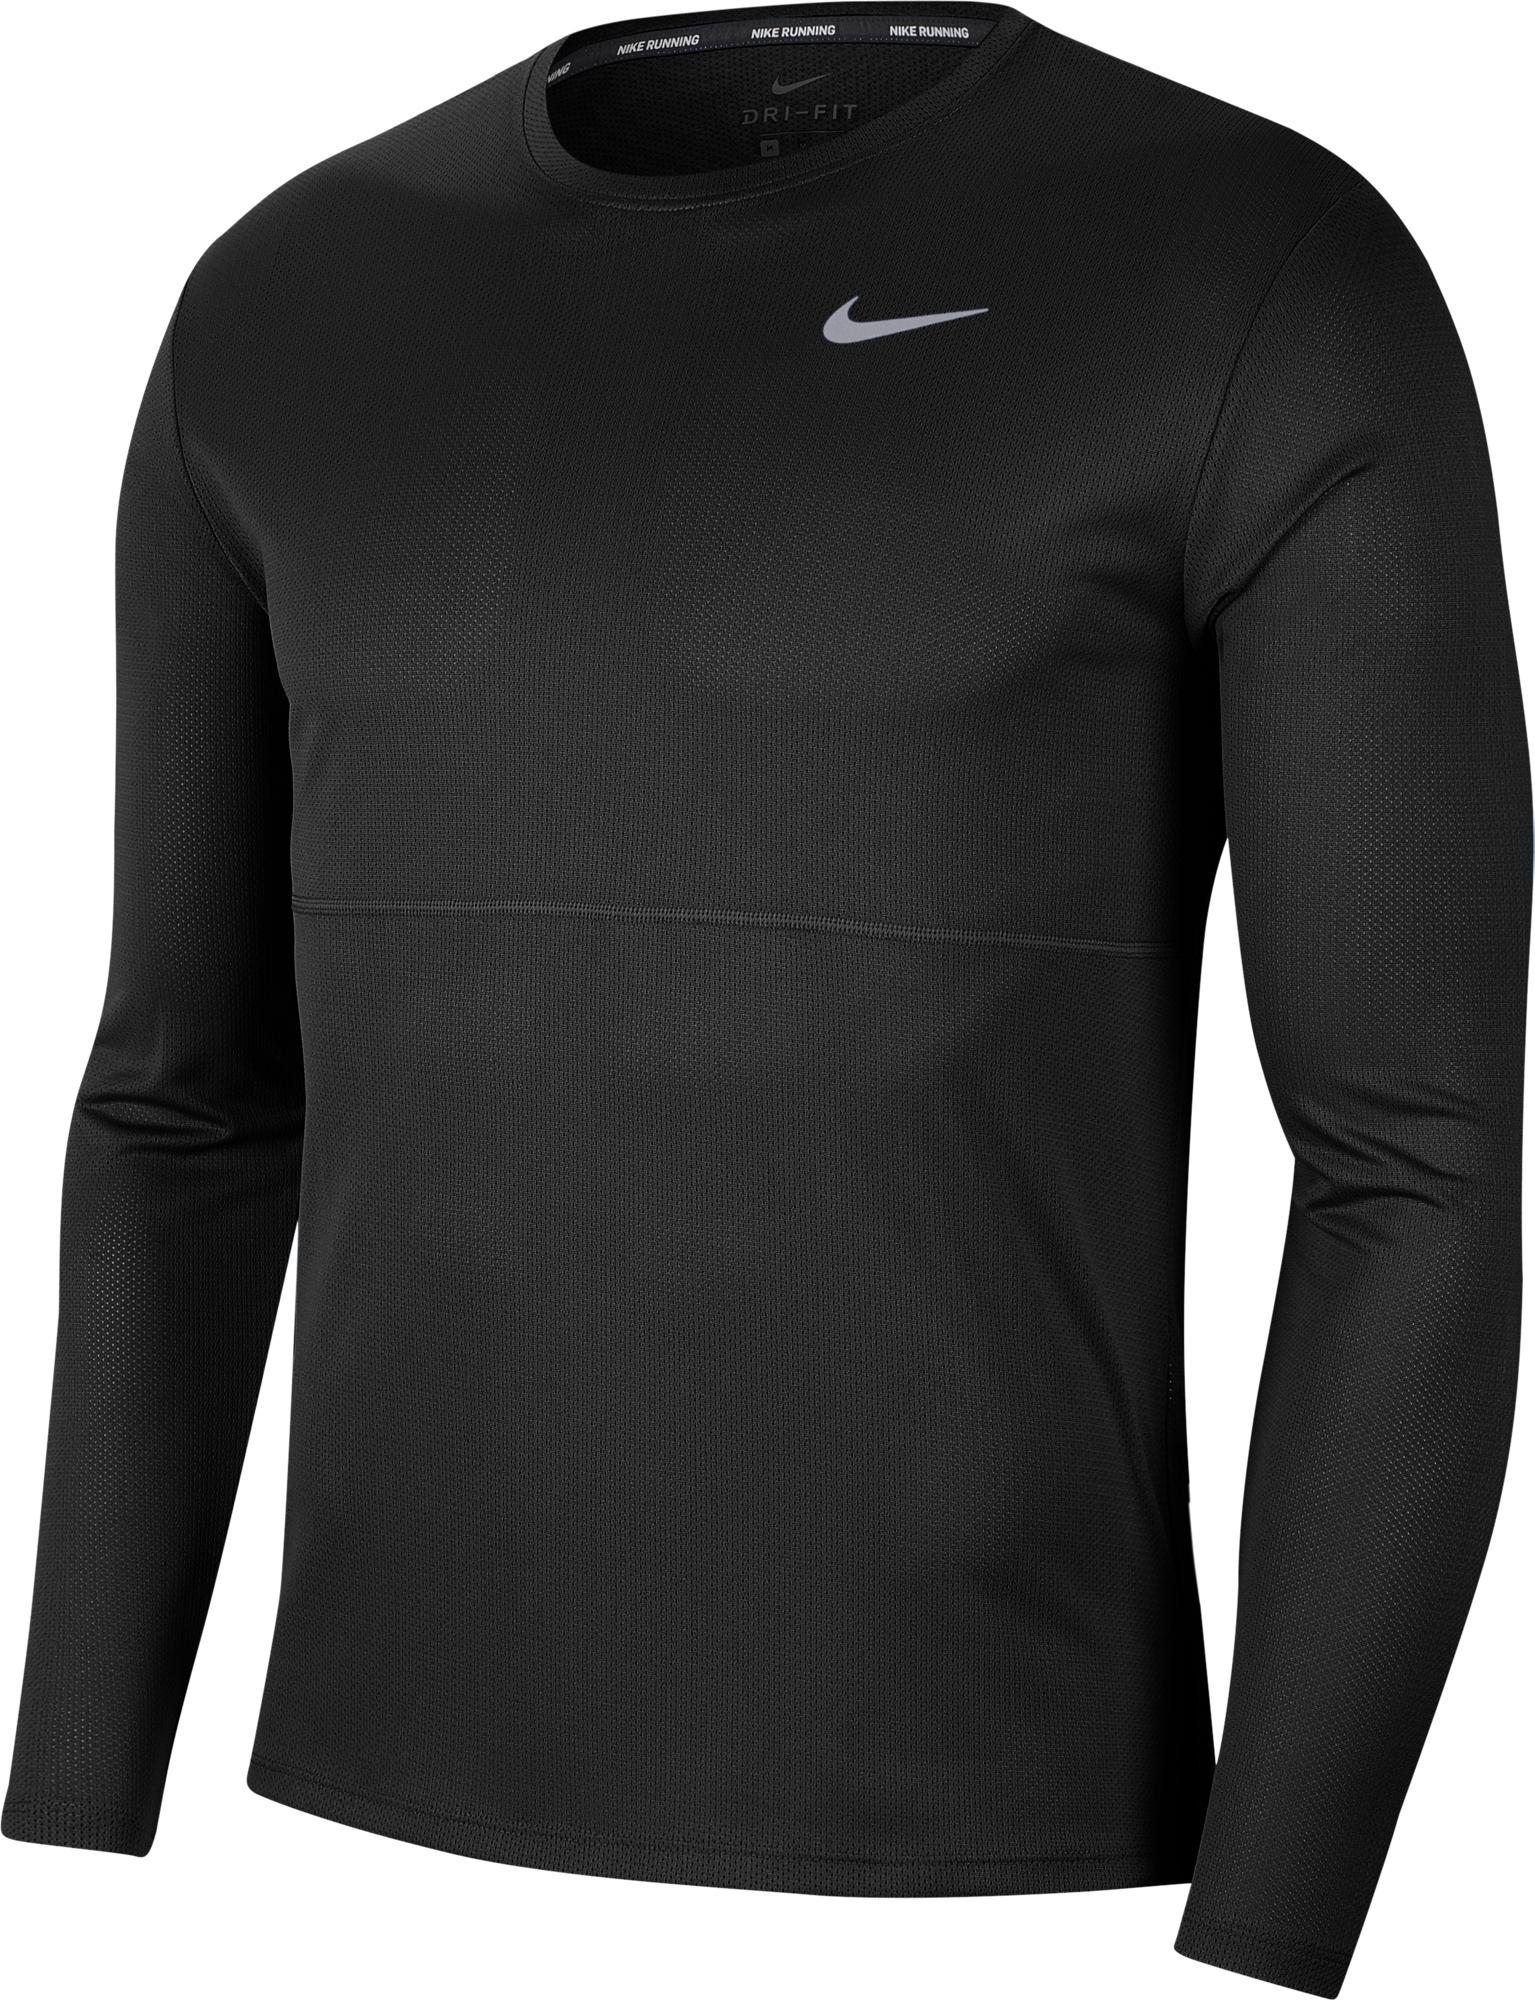 Nike Лонгслив мужской Nike Breathe Run, размер 54-56 лонгслив мужской dc shoes rebuilt цвет белый черный edyzt03505 wbb0 размер xxl 54